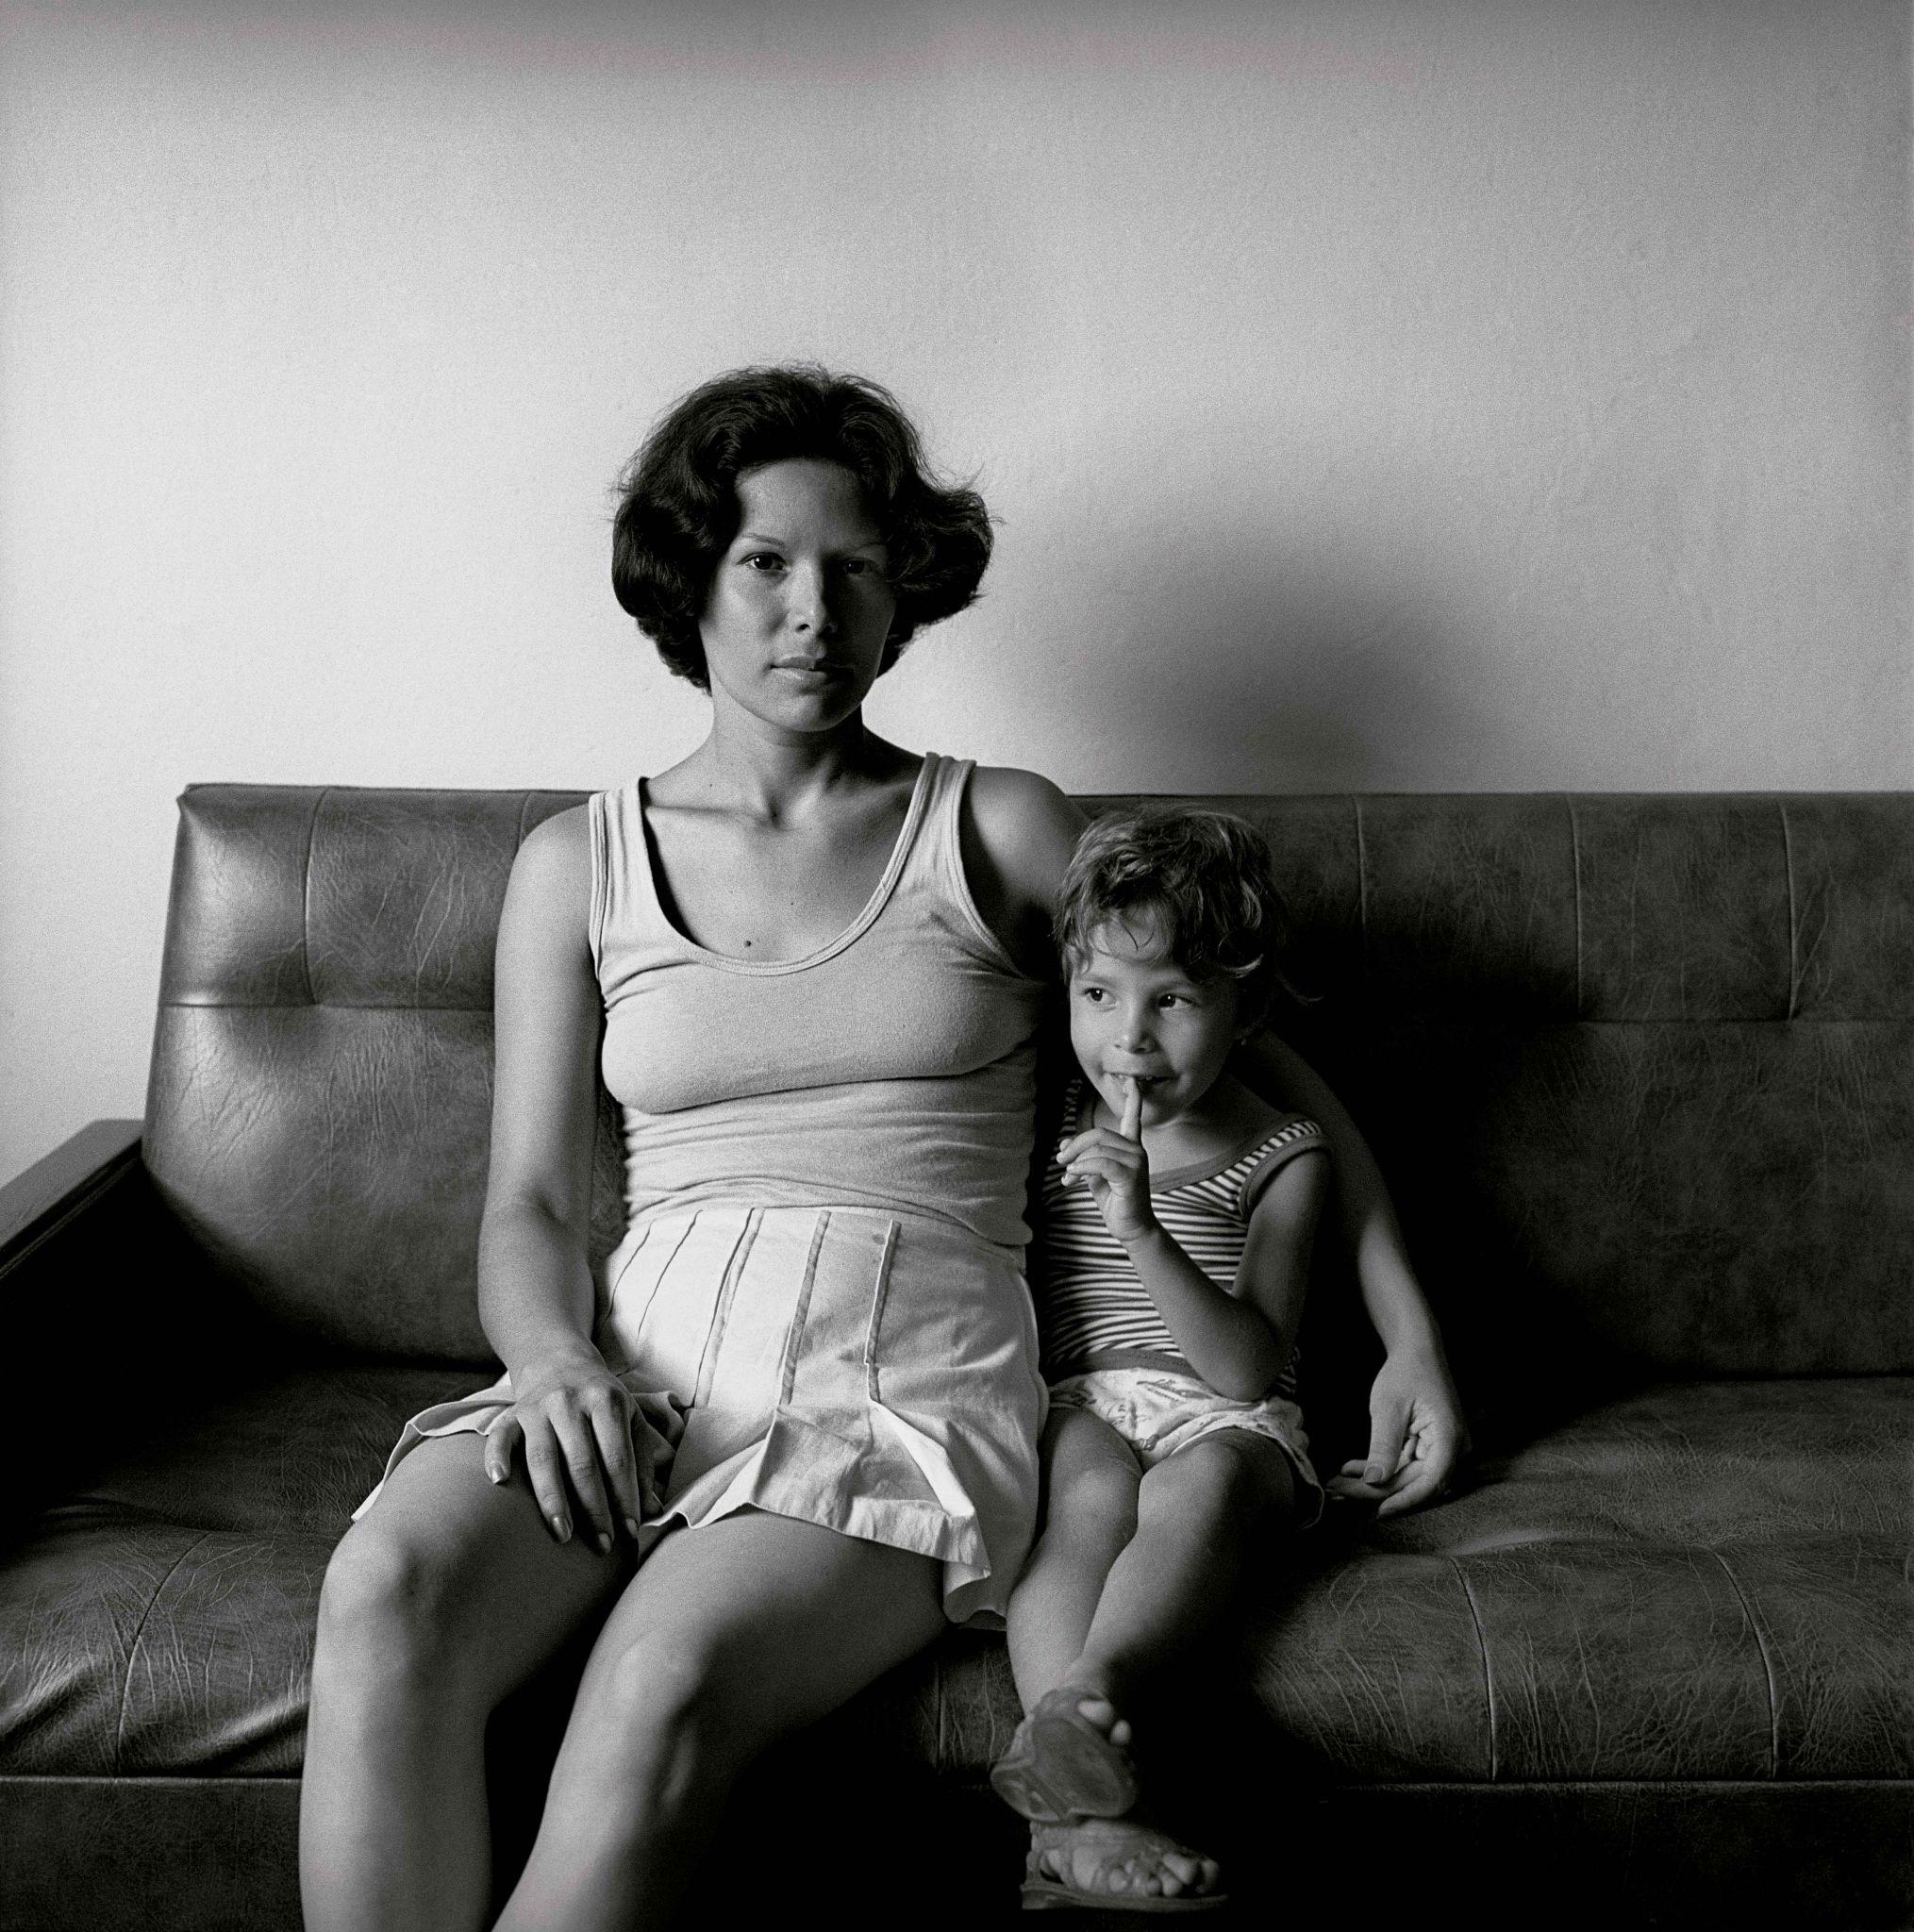 1979-61-04-Mãe-dois-filhos-2